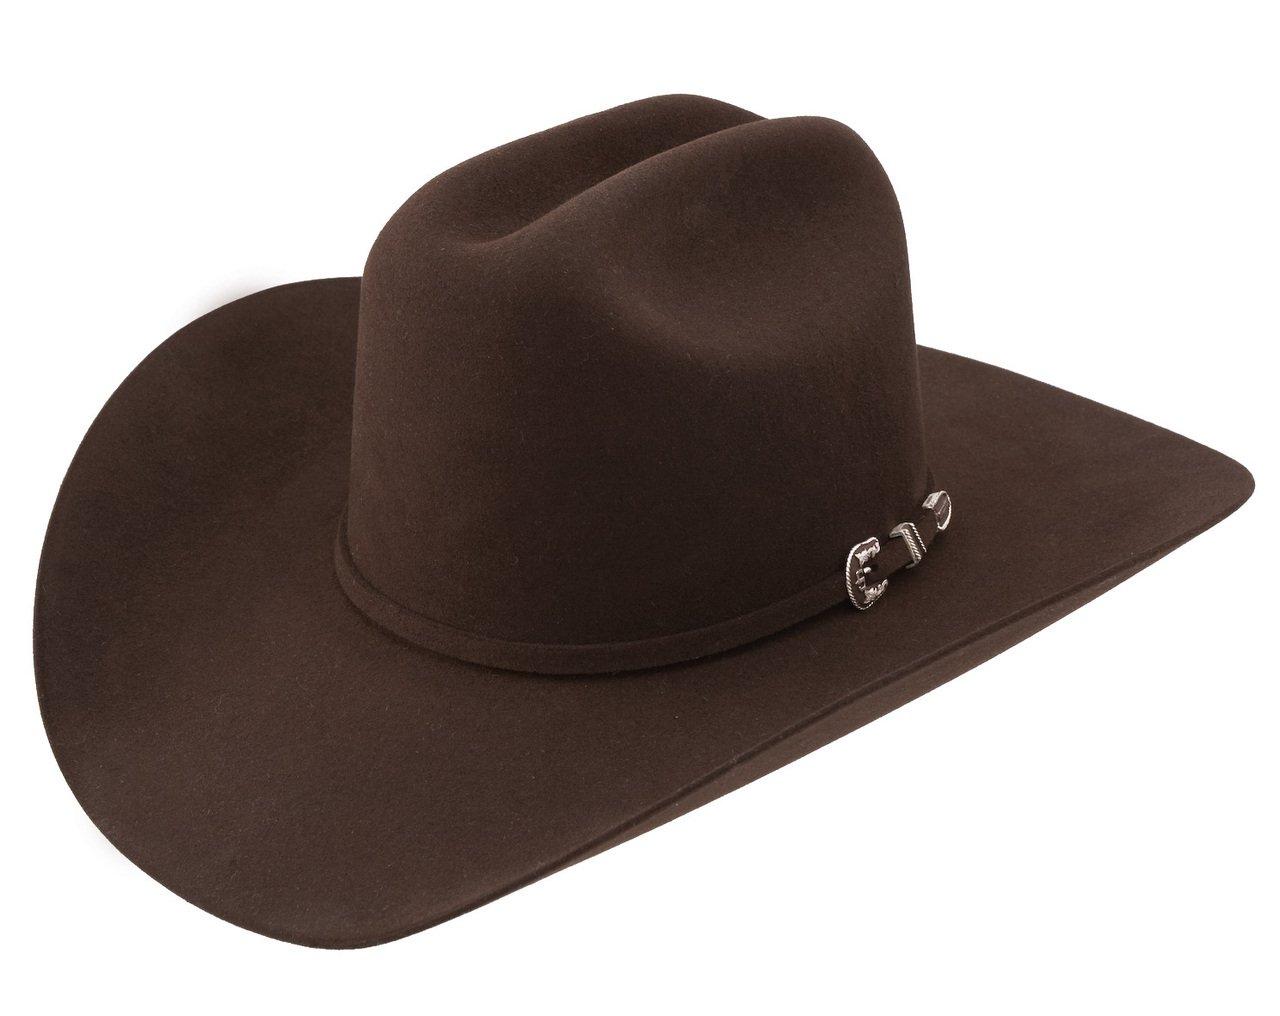 93575856aa05aa Stetson Men's 6X Skyline Fur Felt Western Hat Chocolate 7 1/2